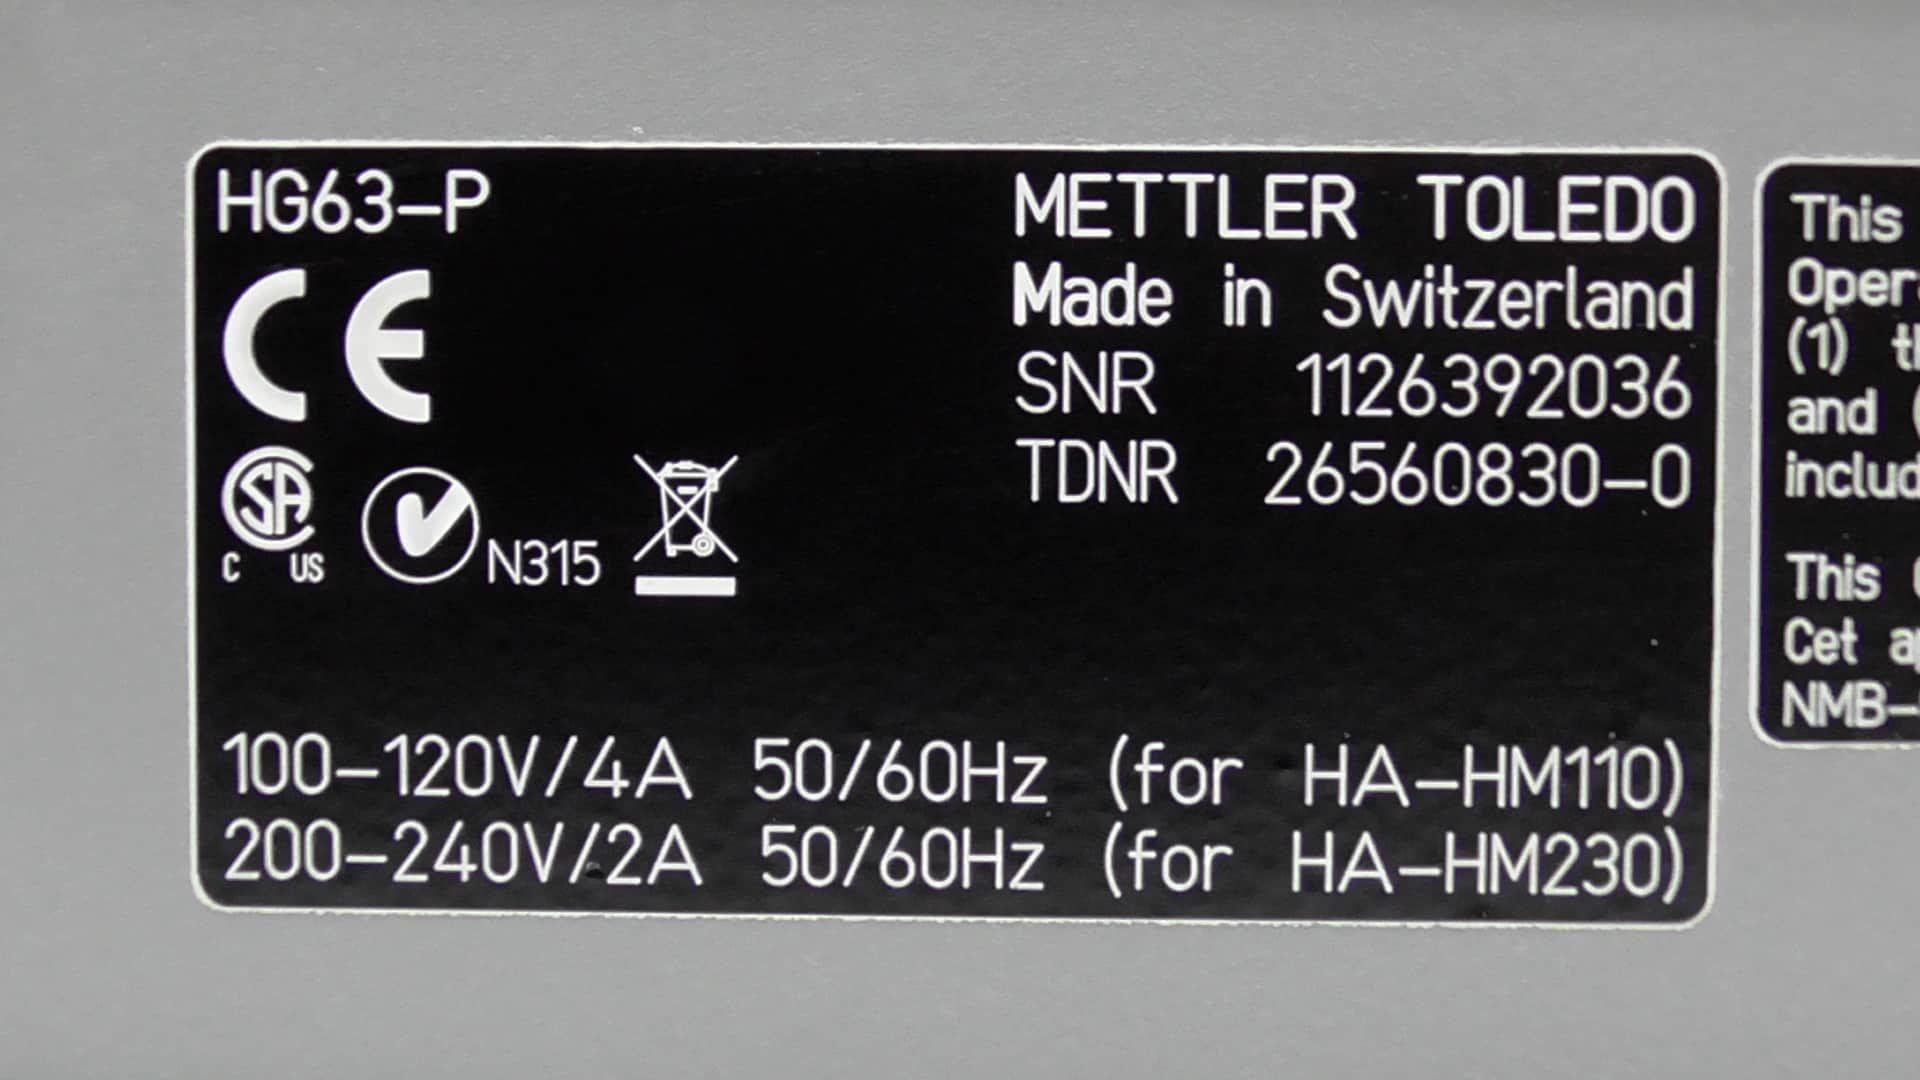 Mettler Toledo HG63-P Moisture Analyzer